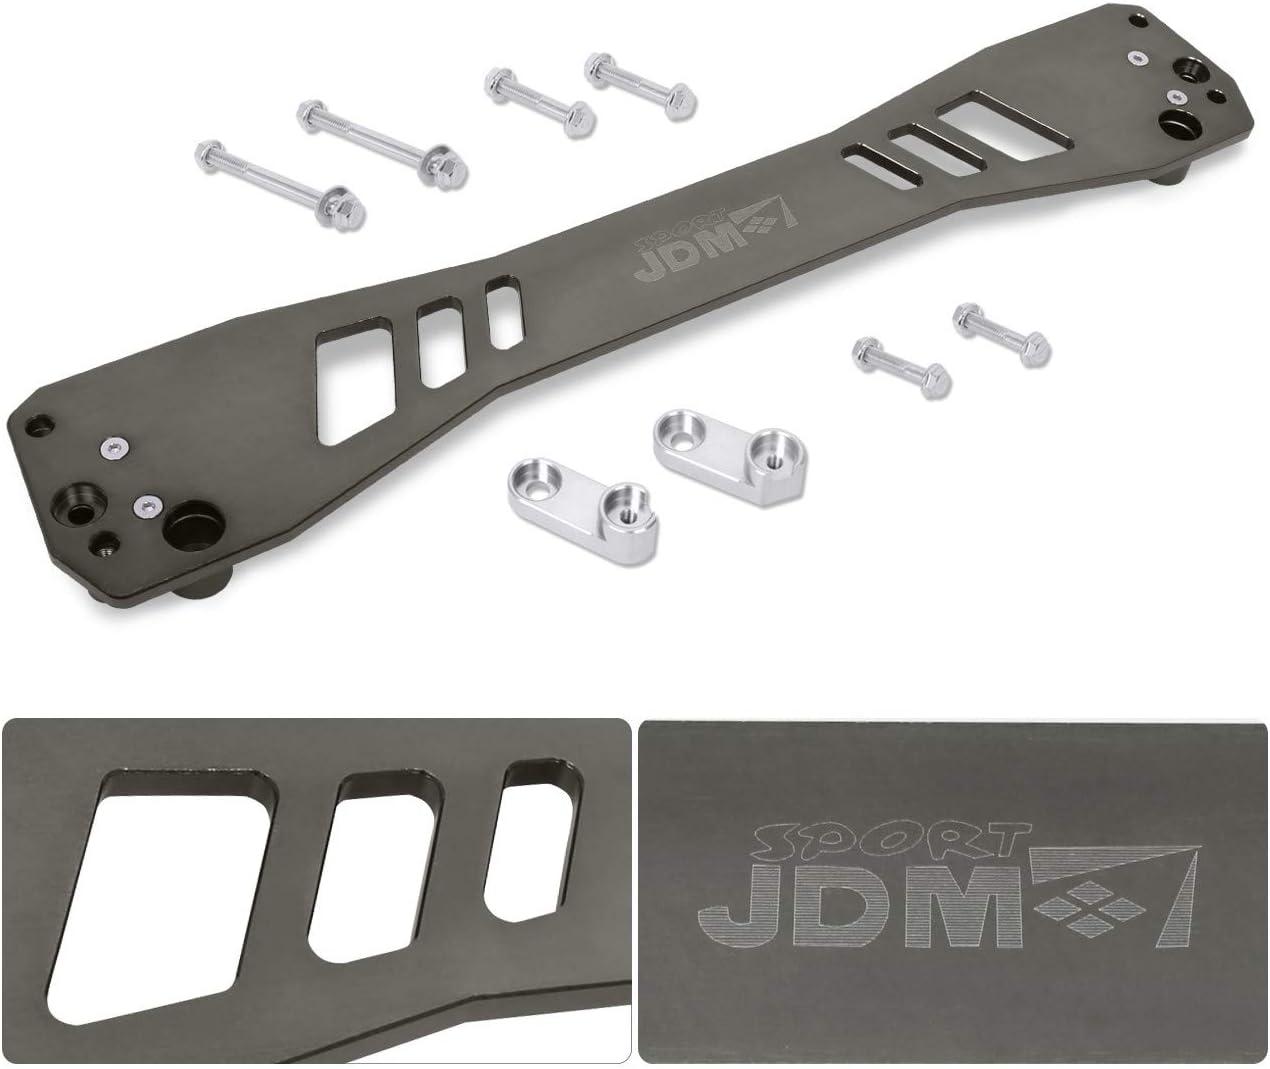 Ajp Distributors Red Suspension Subframe Tie Brace For Honda Civic Upgrade Performance Replacement Handling